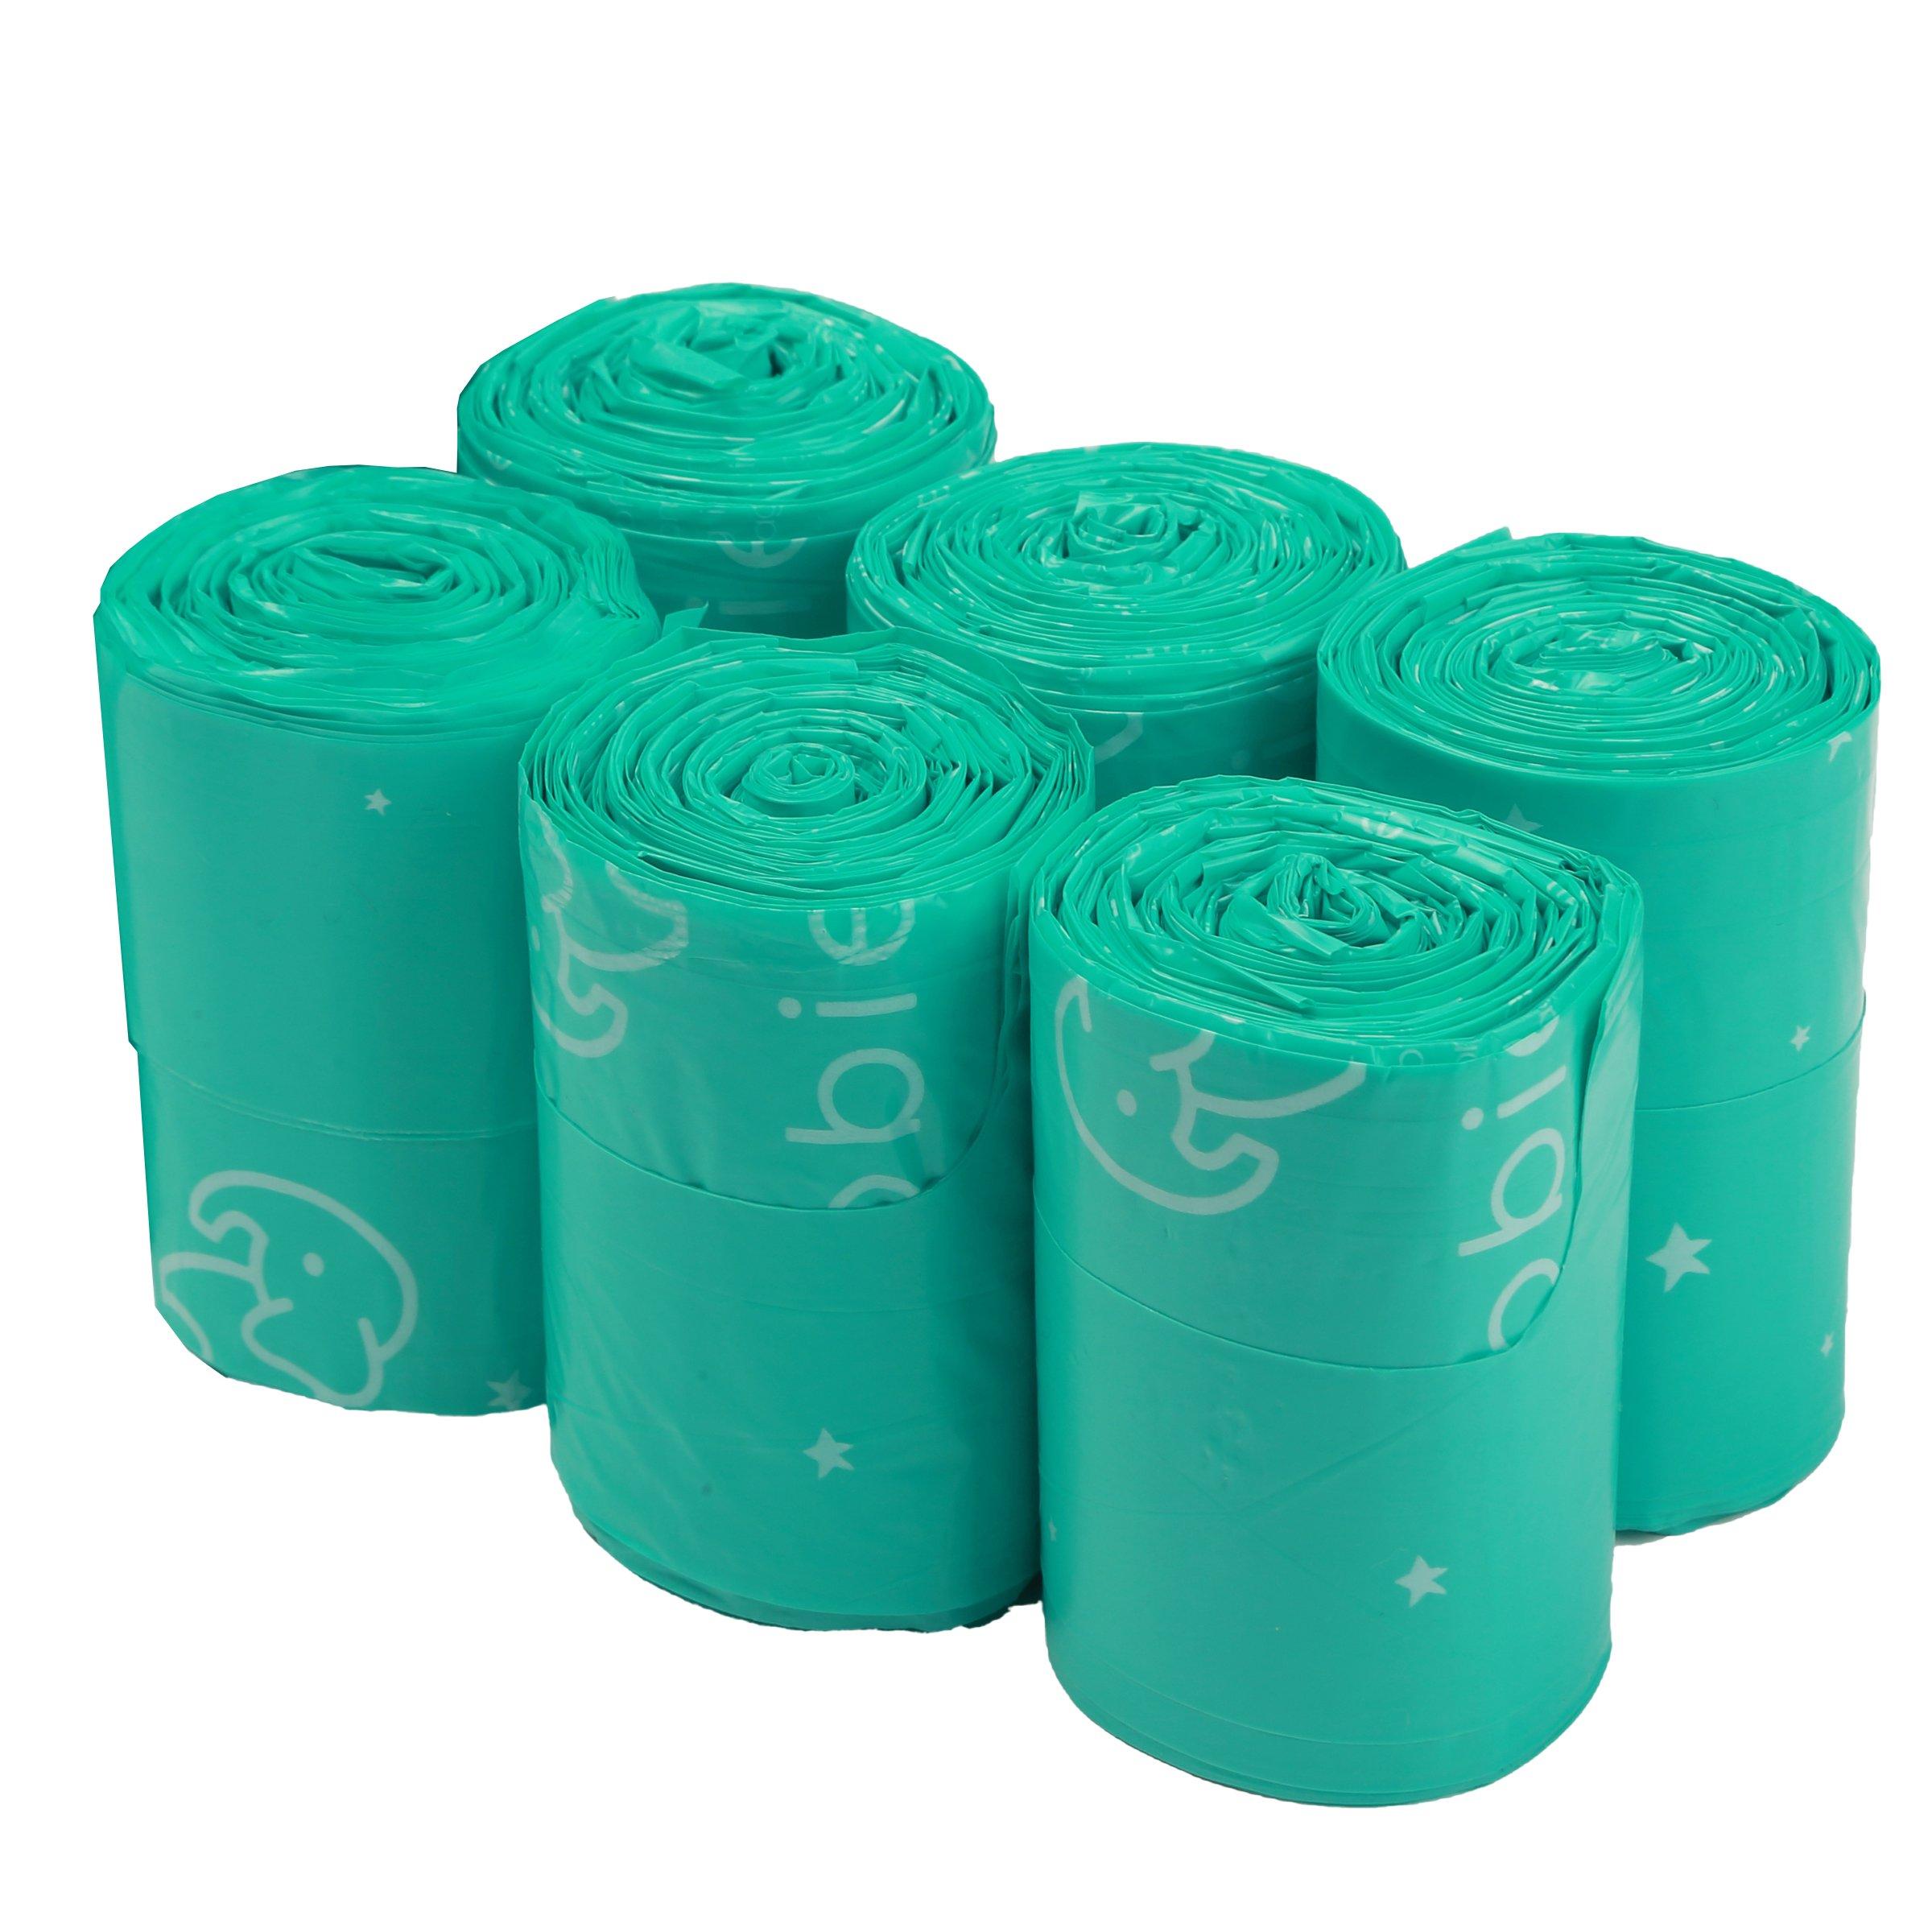 Goobie Baby Diaper Bag Dispenser Refill Rolls of Unscented Disposable Refill Bags   Waste Bag (6 Roll Bag Refill - 150 Bags) by Goobie Baby